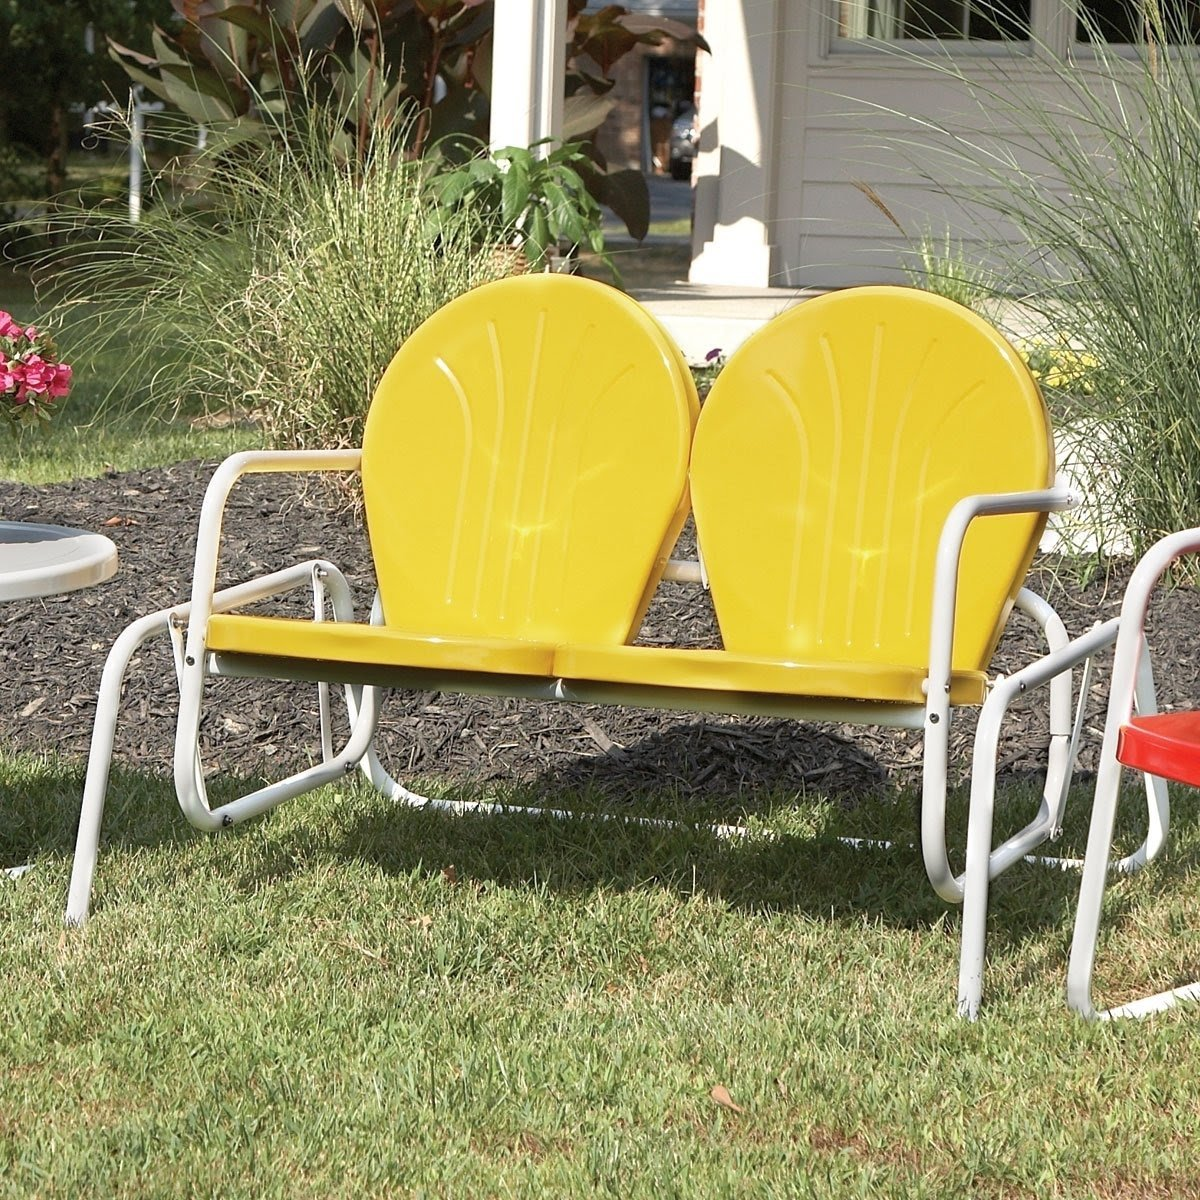 Superbe Vintage Metal Chairs Outdoor | Retro Metal Glider Lawn .